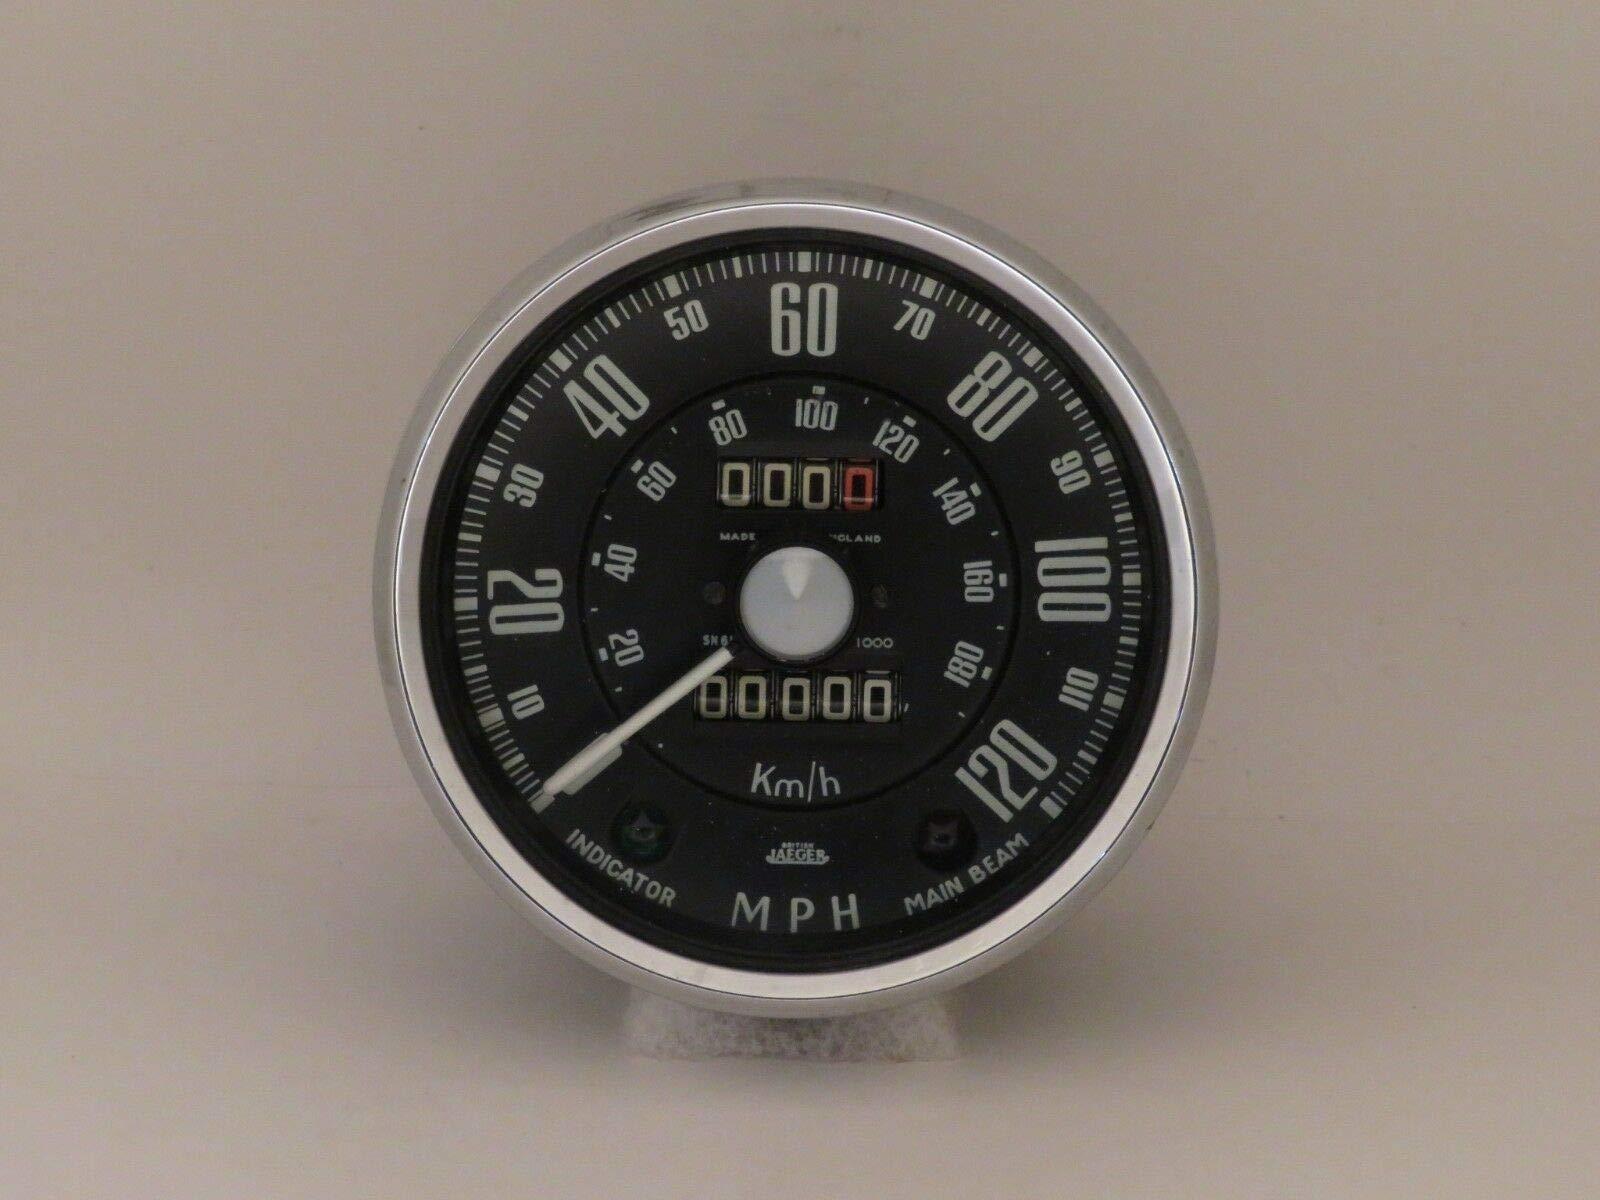 EPC Speedometer 120MPH Jaeger Brand Fits Sunbeam Alpine Series 2 SN6117/11 by EPC